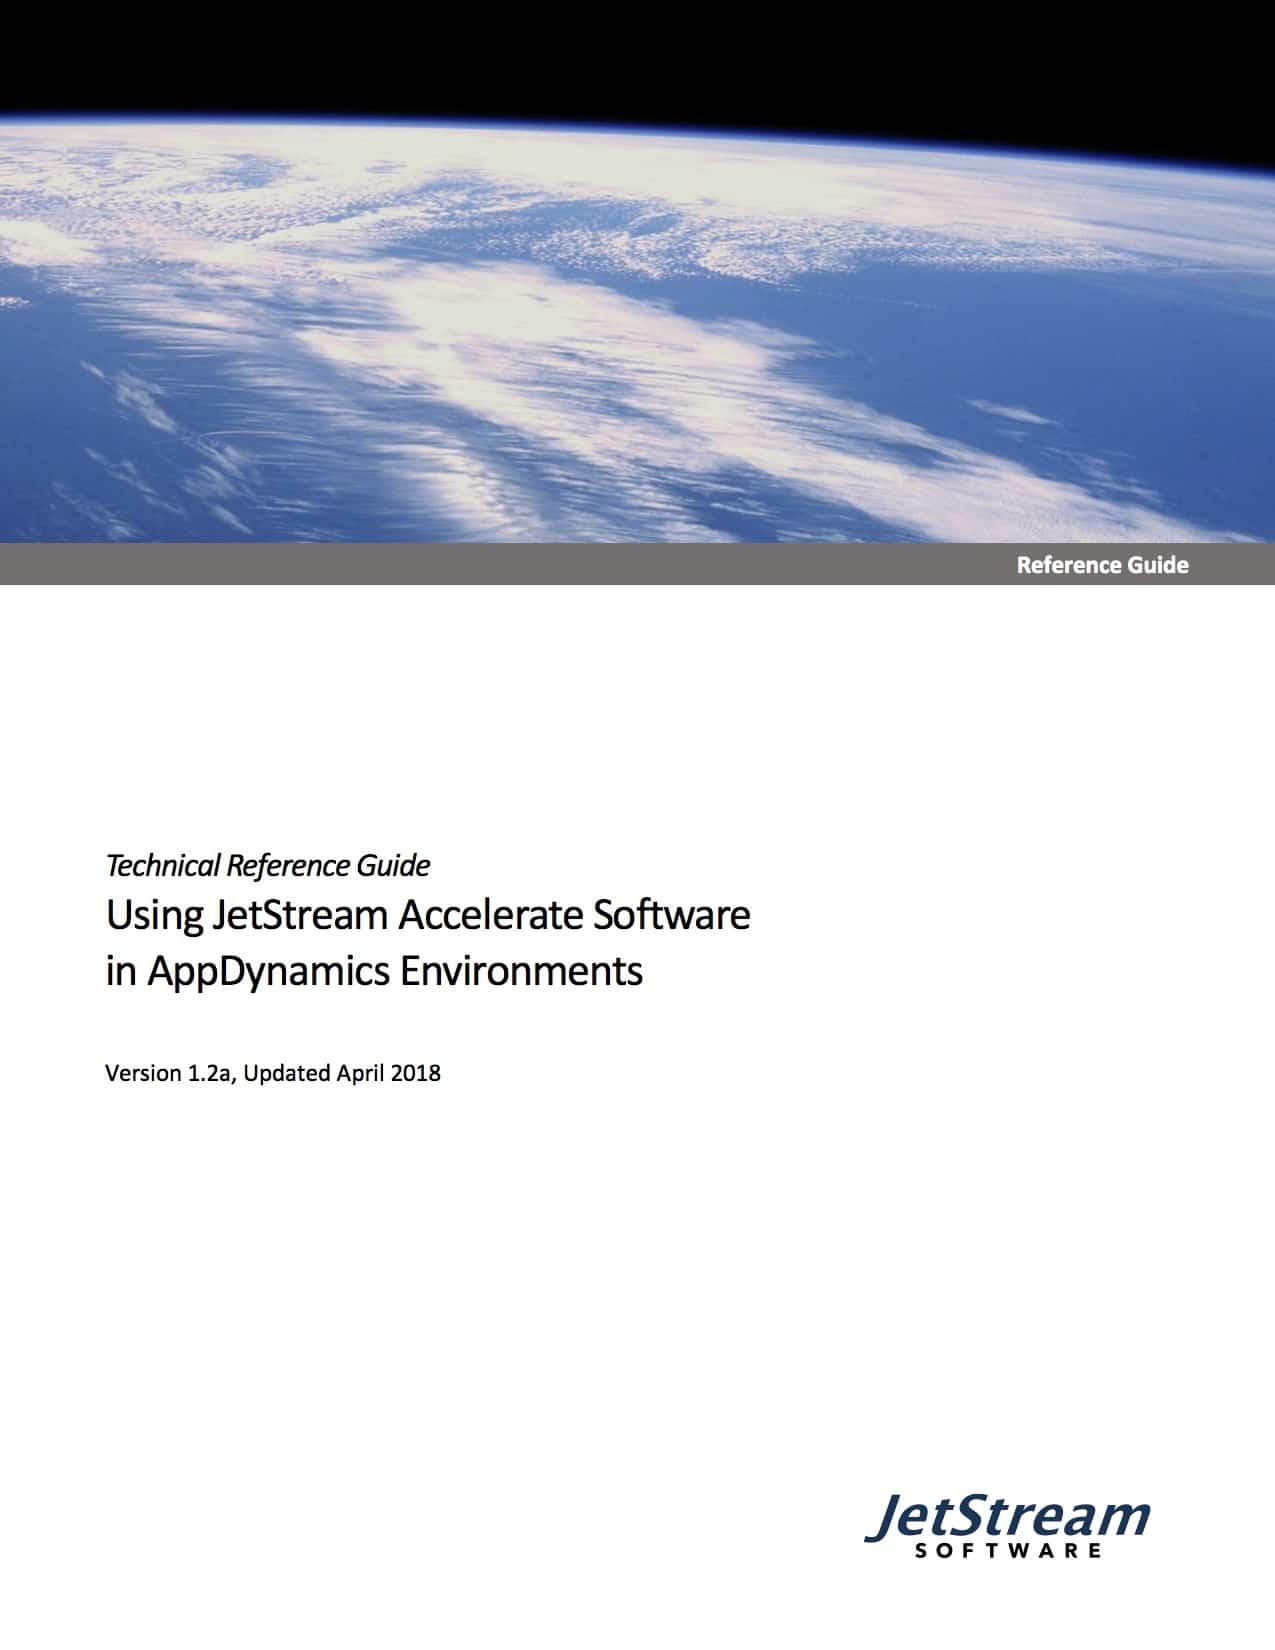 JetStreamAccelerate_Tech_Overview_Cover_v1.2a